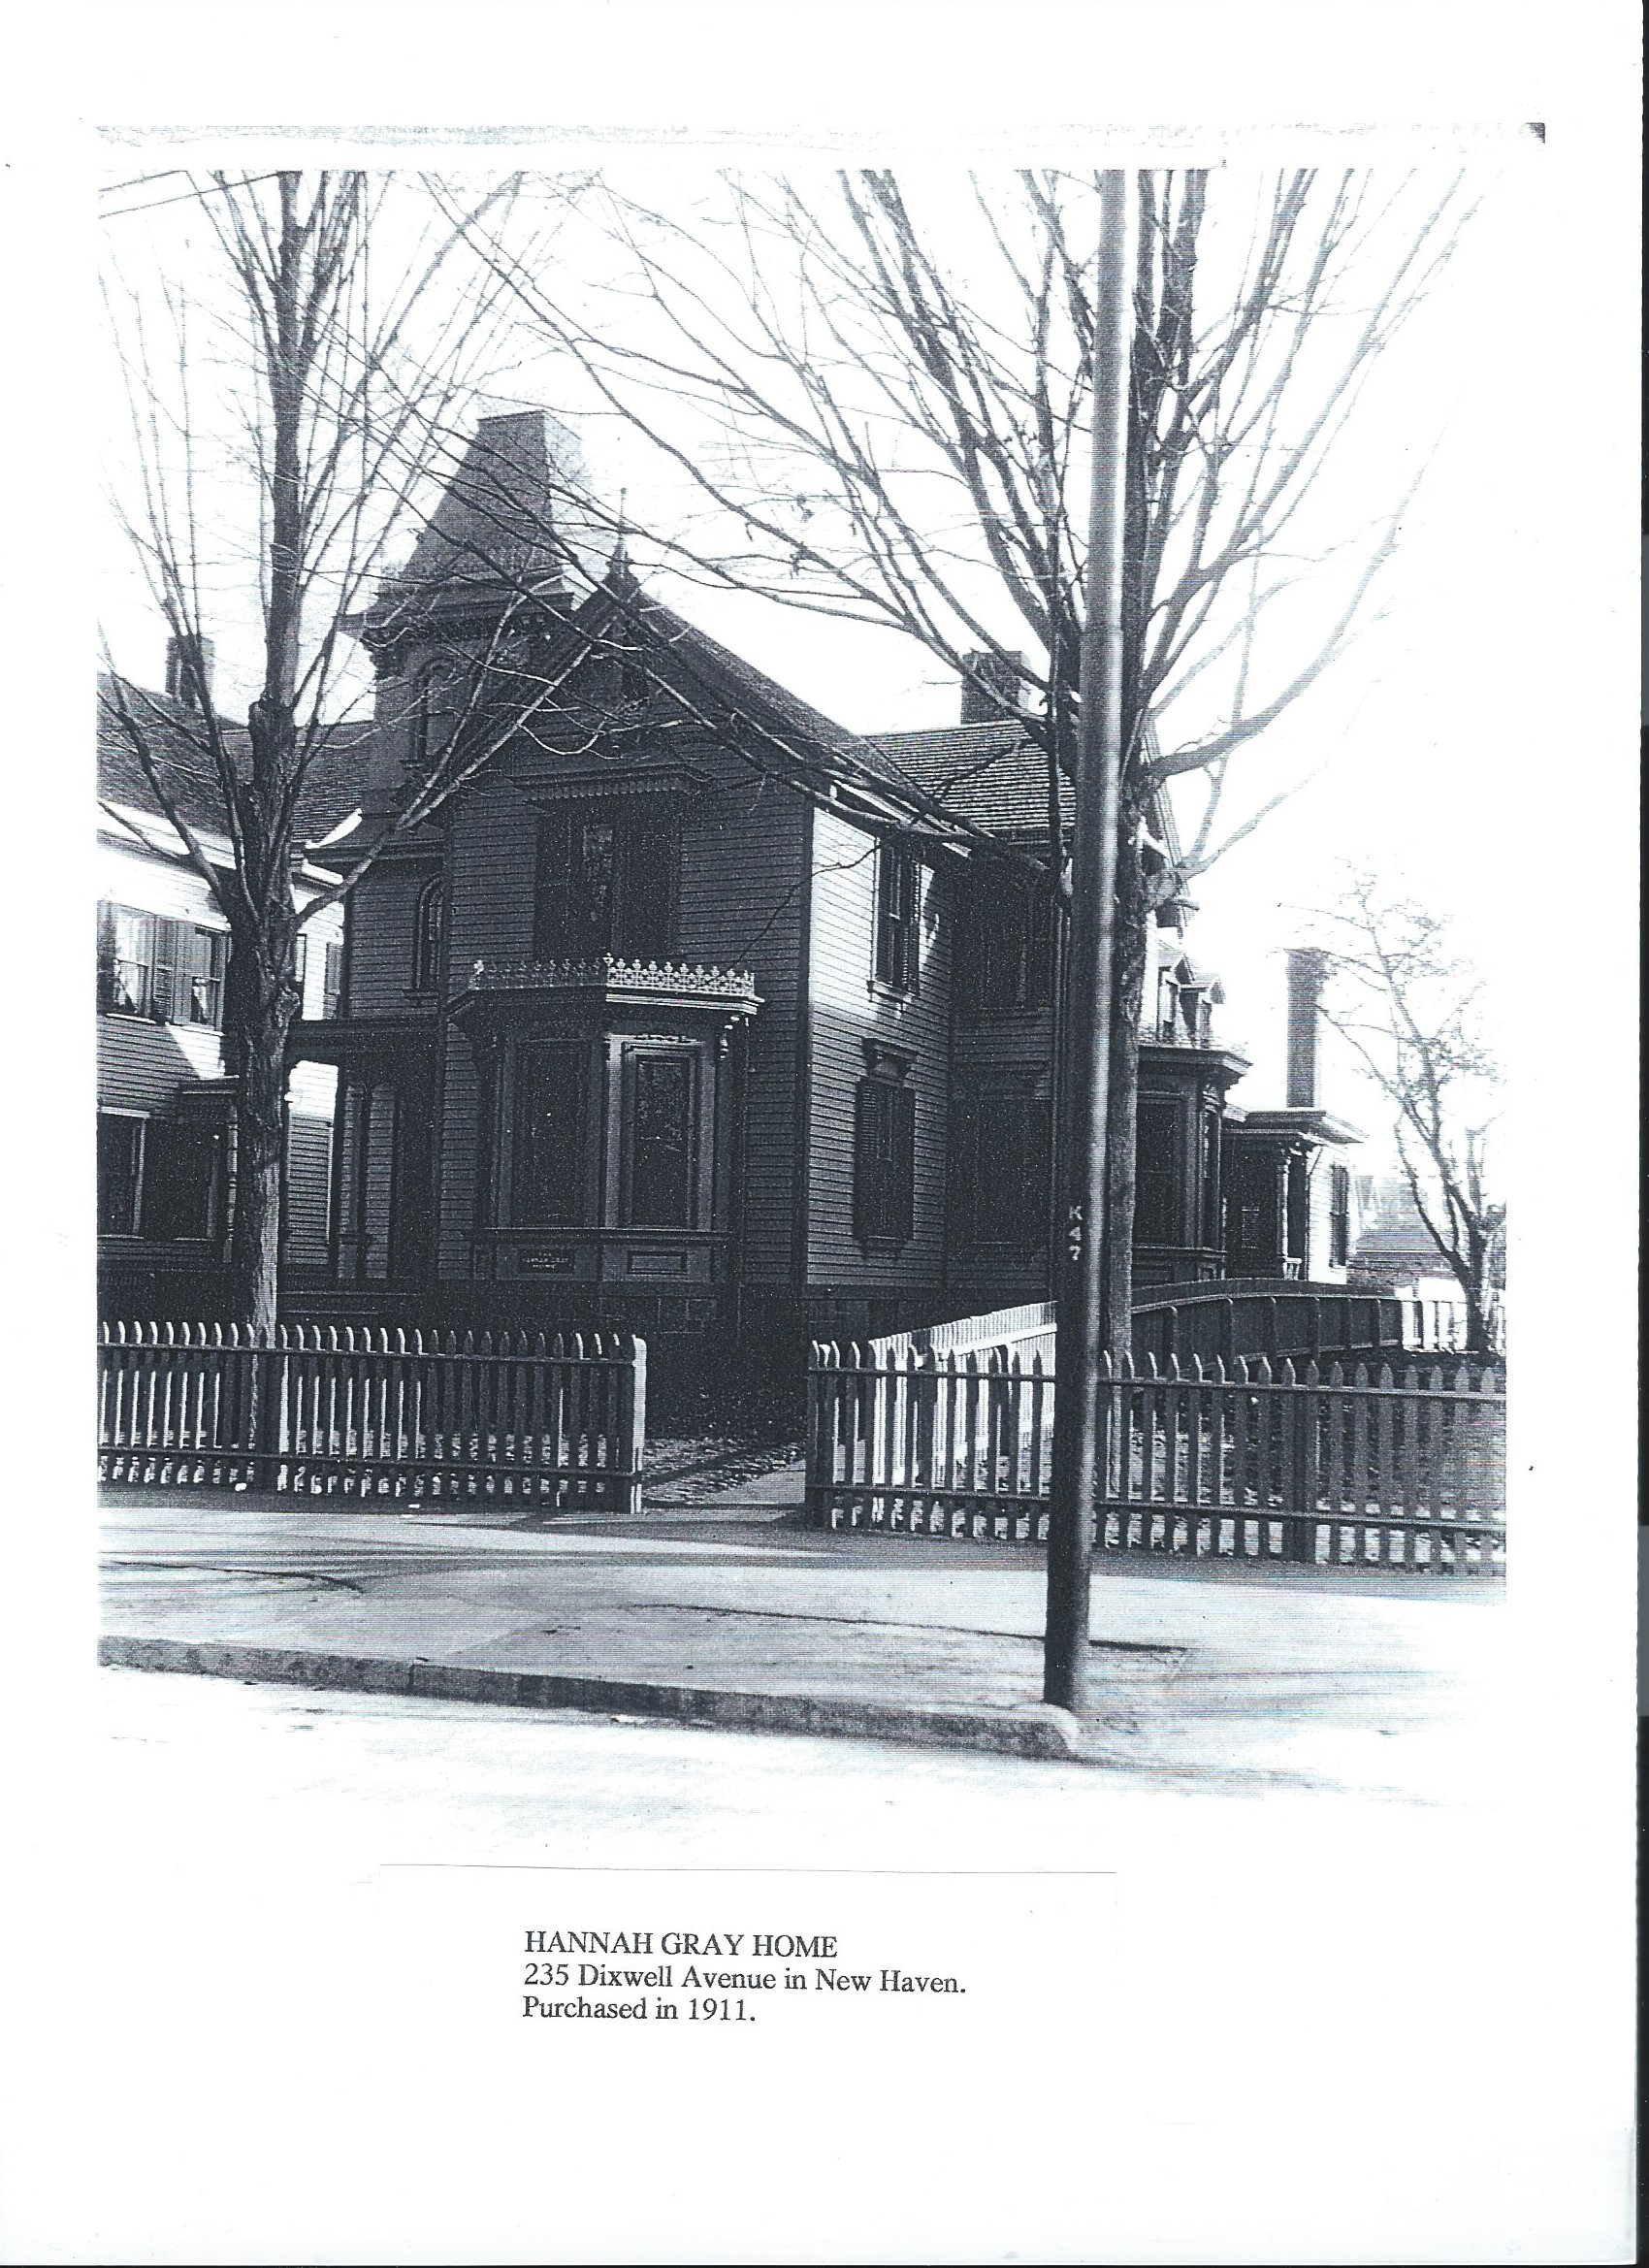 Hannah Gray Home